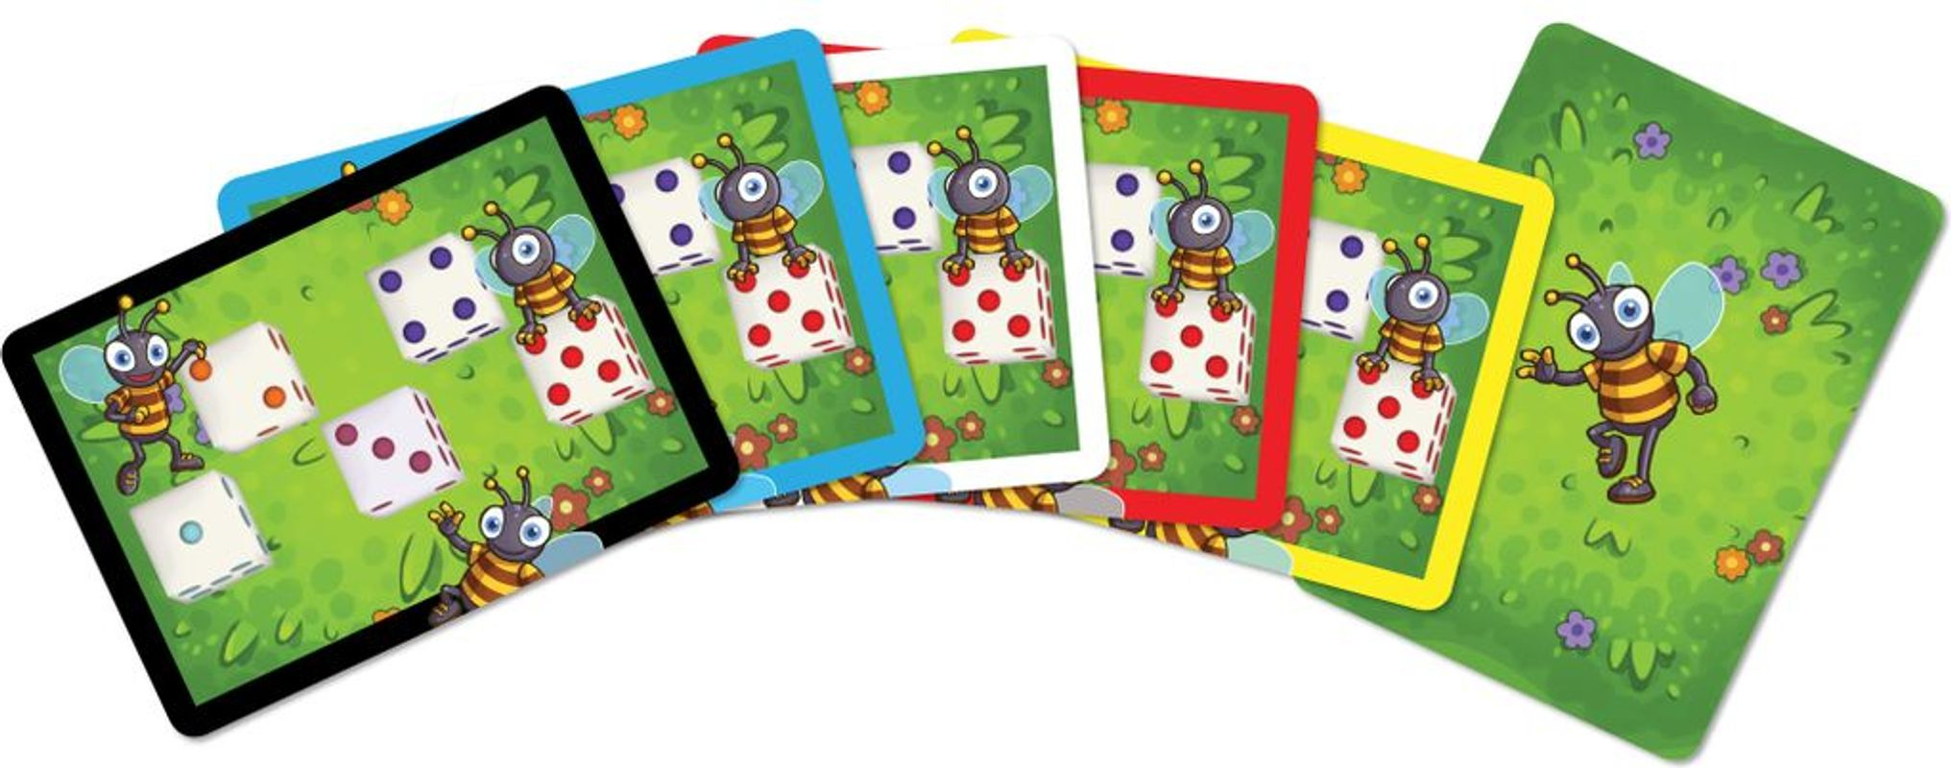 BEEEEES! cards